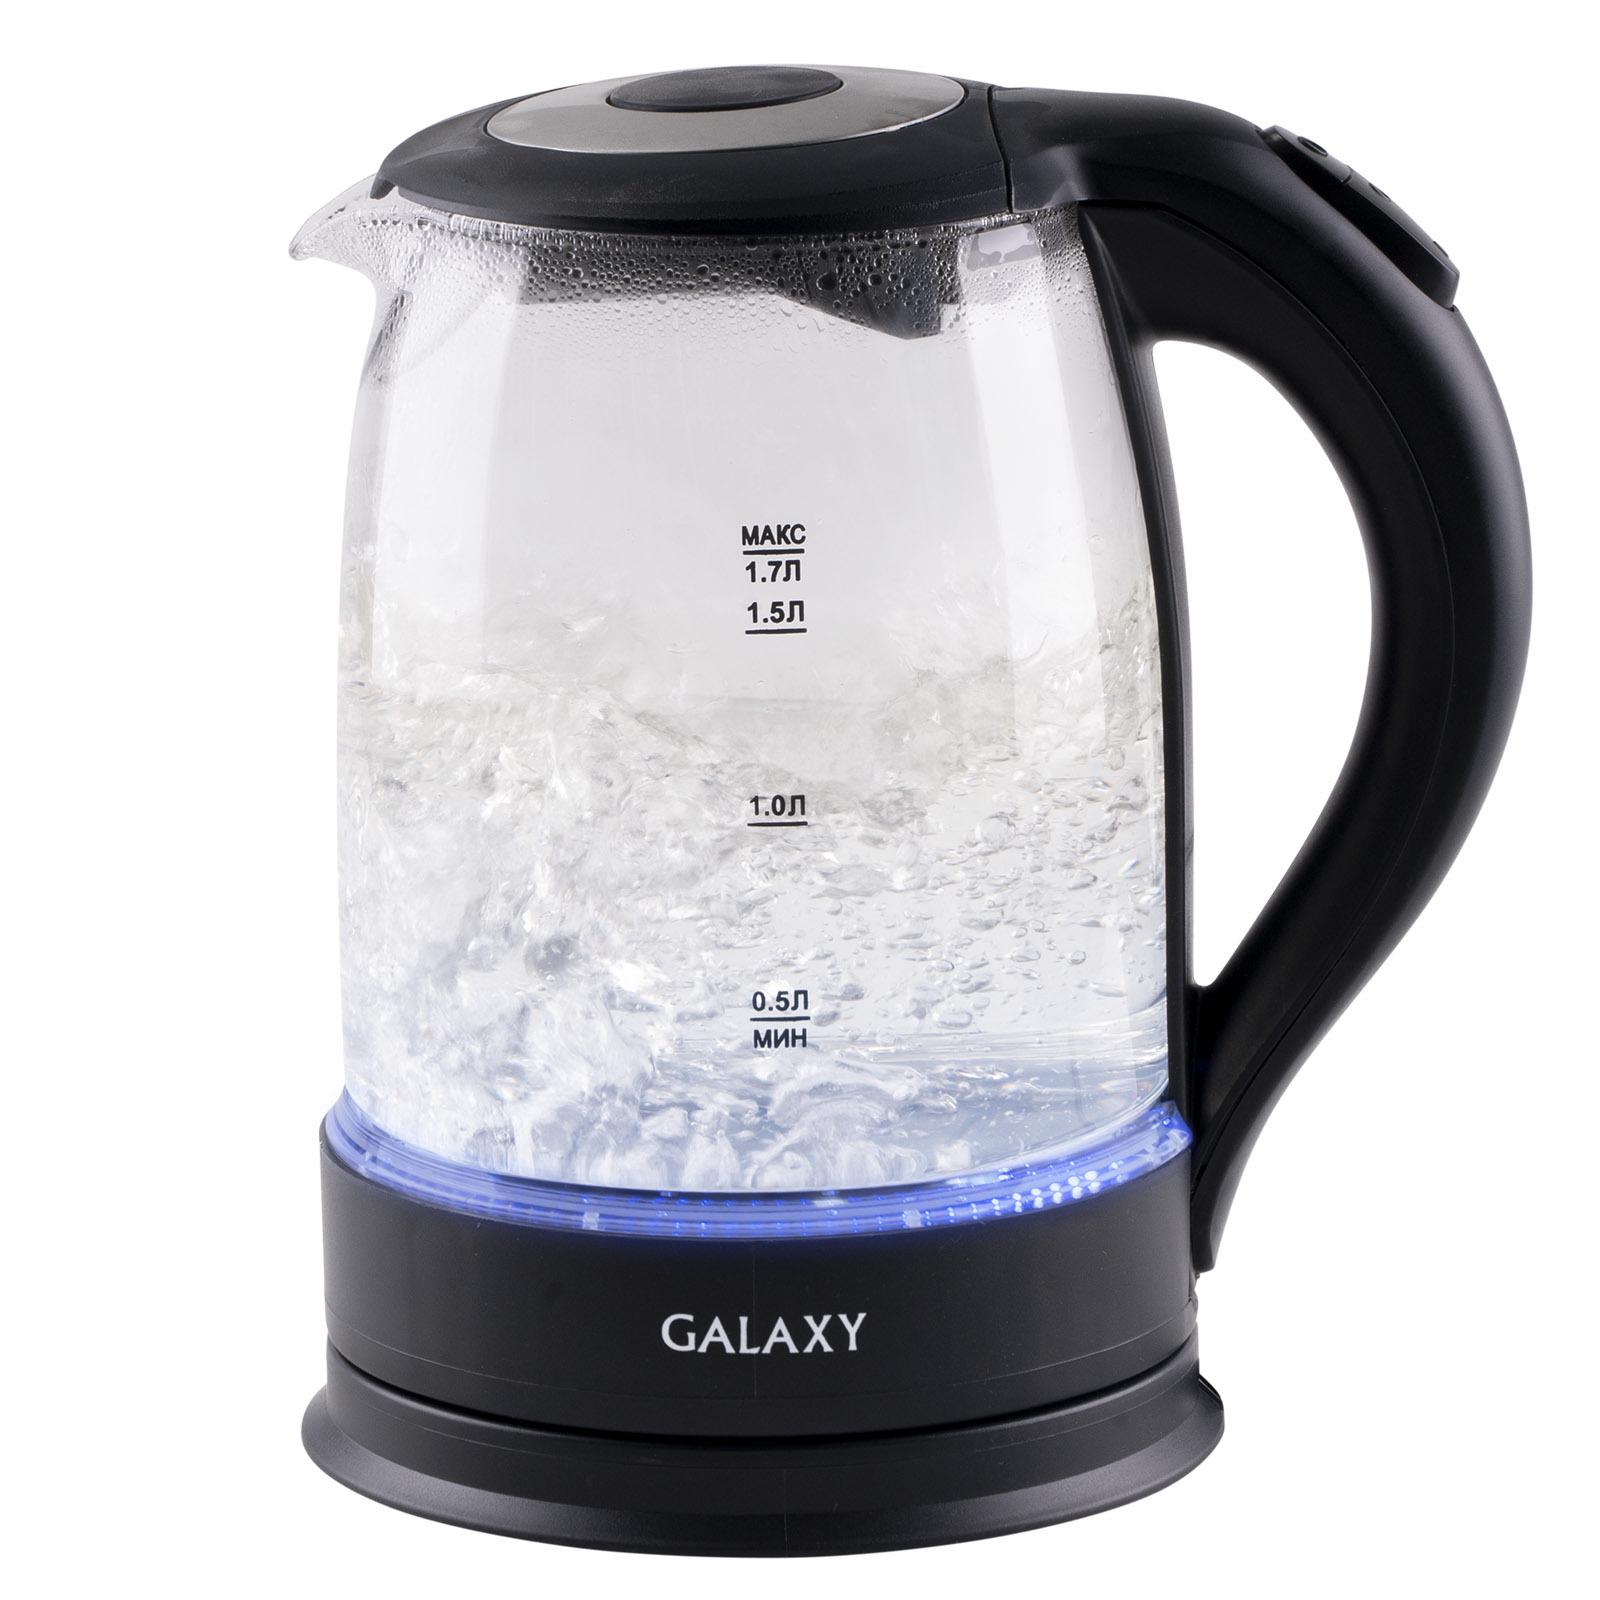 Электрический чайник Galaxy GL0553, черный, 1,7 л цены онлайн